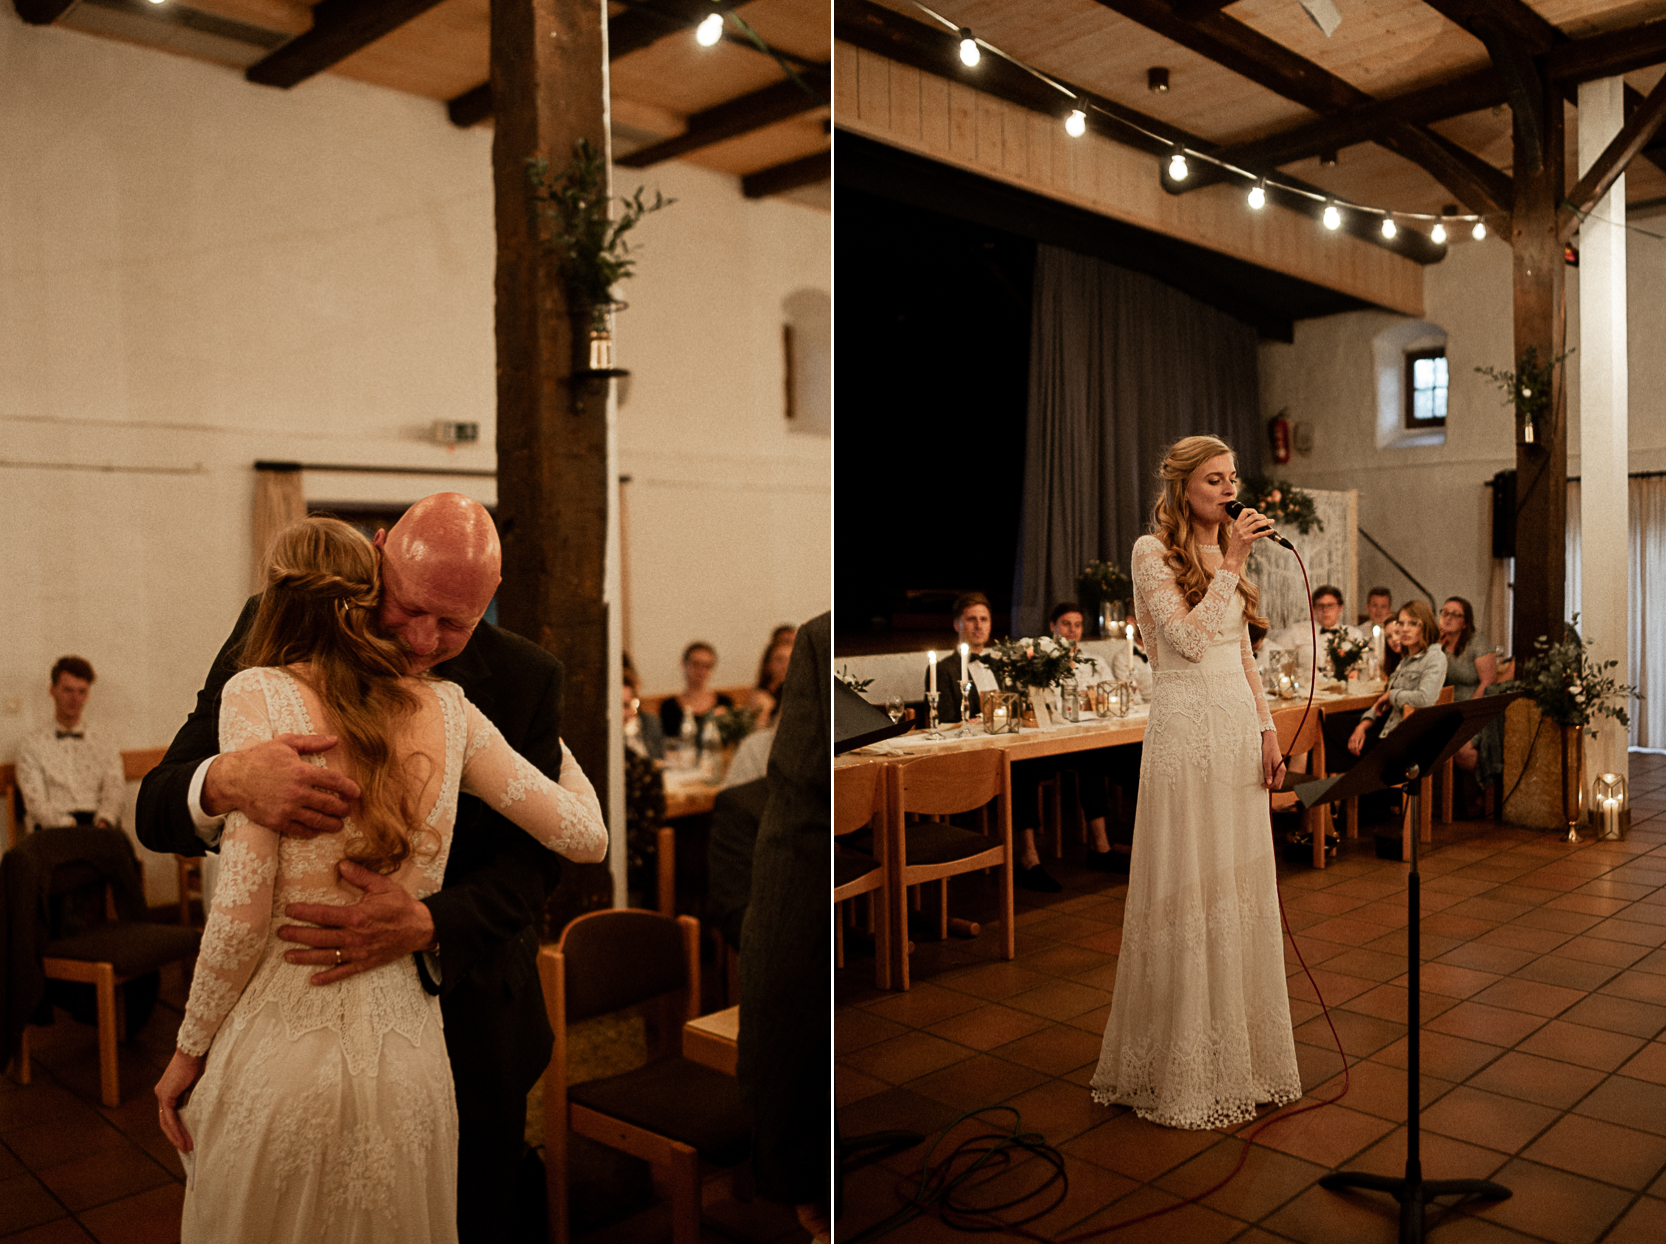 wholeheartedweddings-Timo-Matthies-Sean&Judy-boho-Barnweddings-1-2_hoch_10.jpg